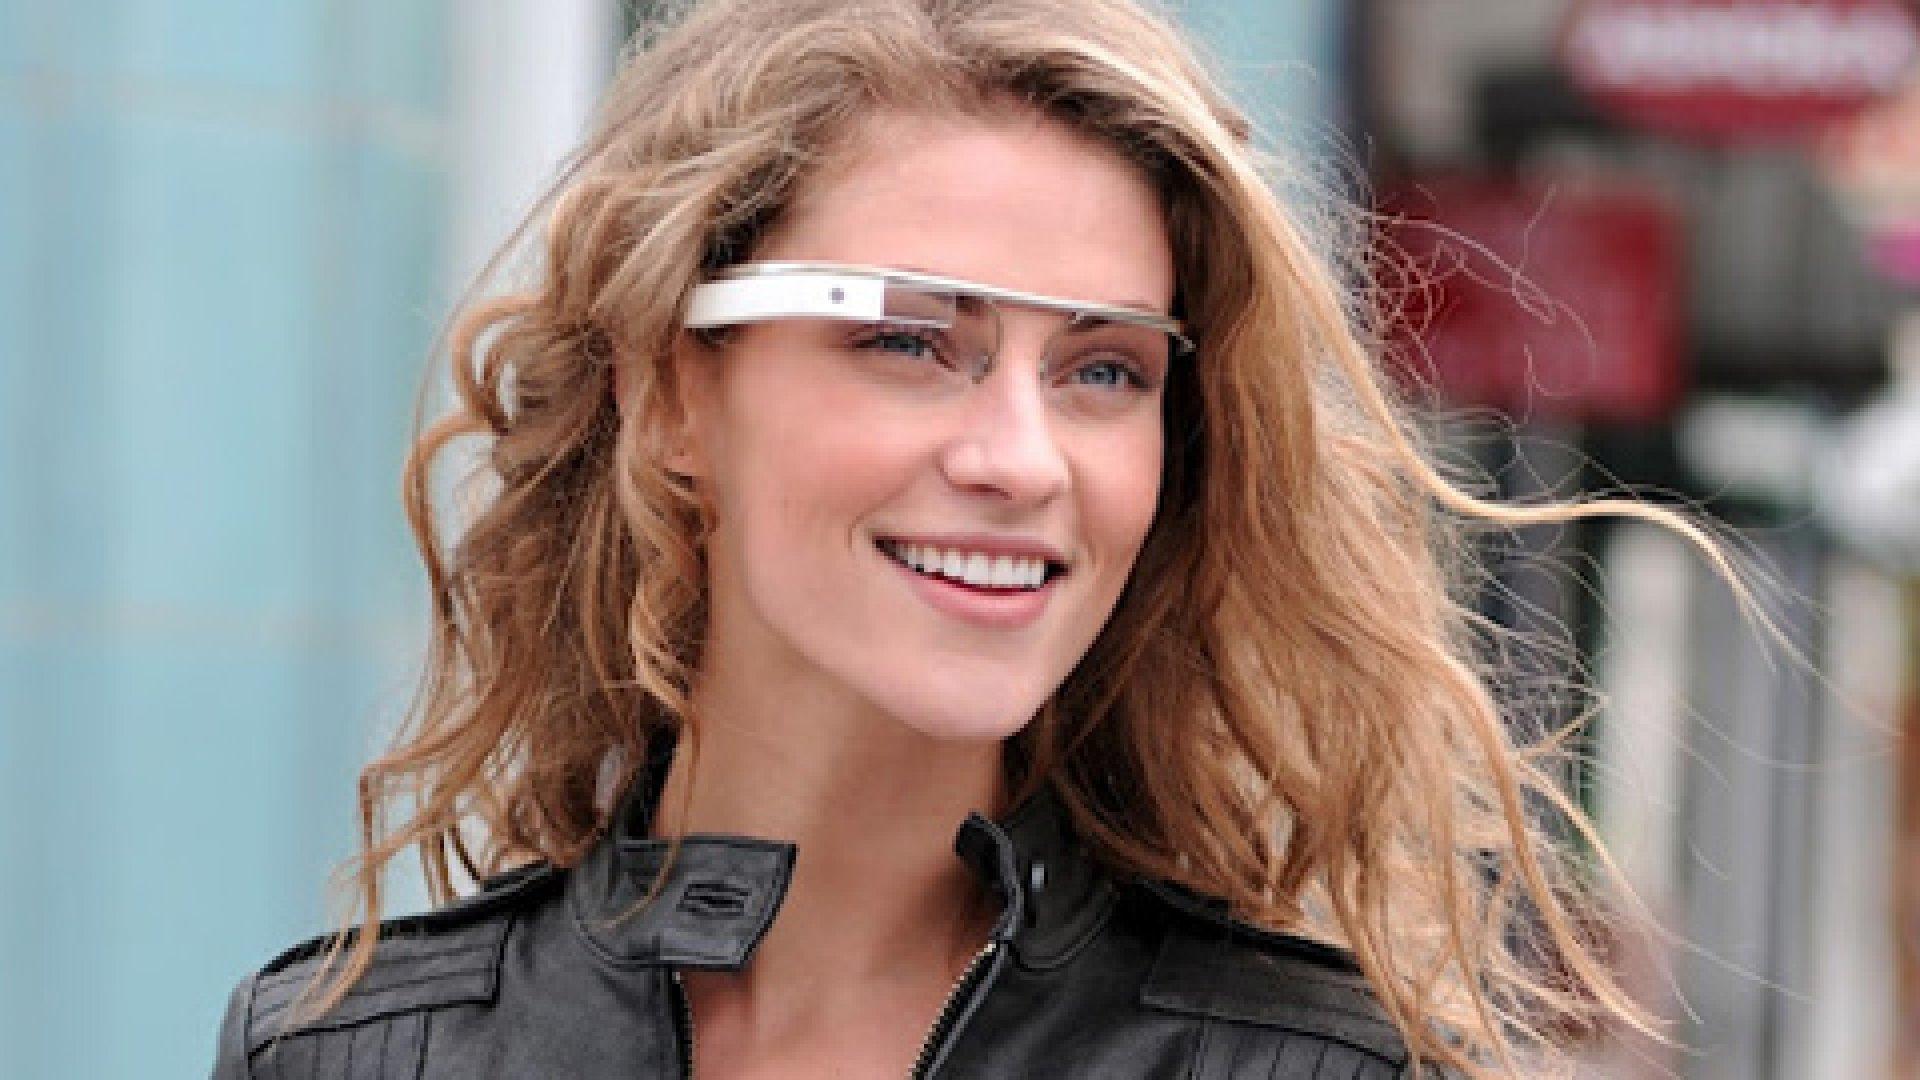 Google Glasses: The Future of Work?